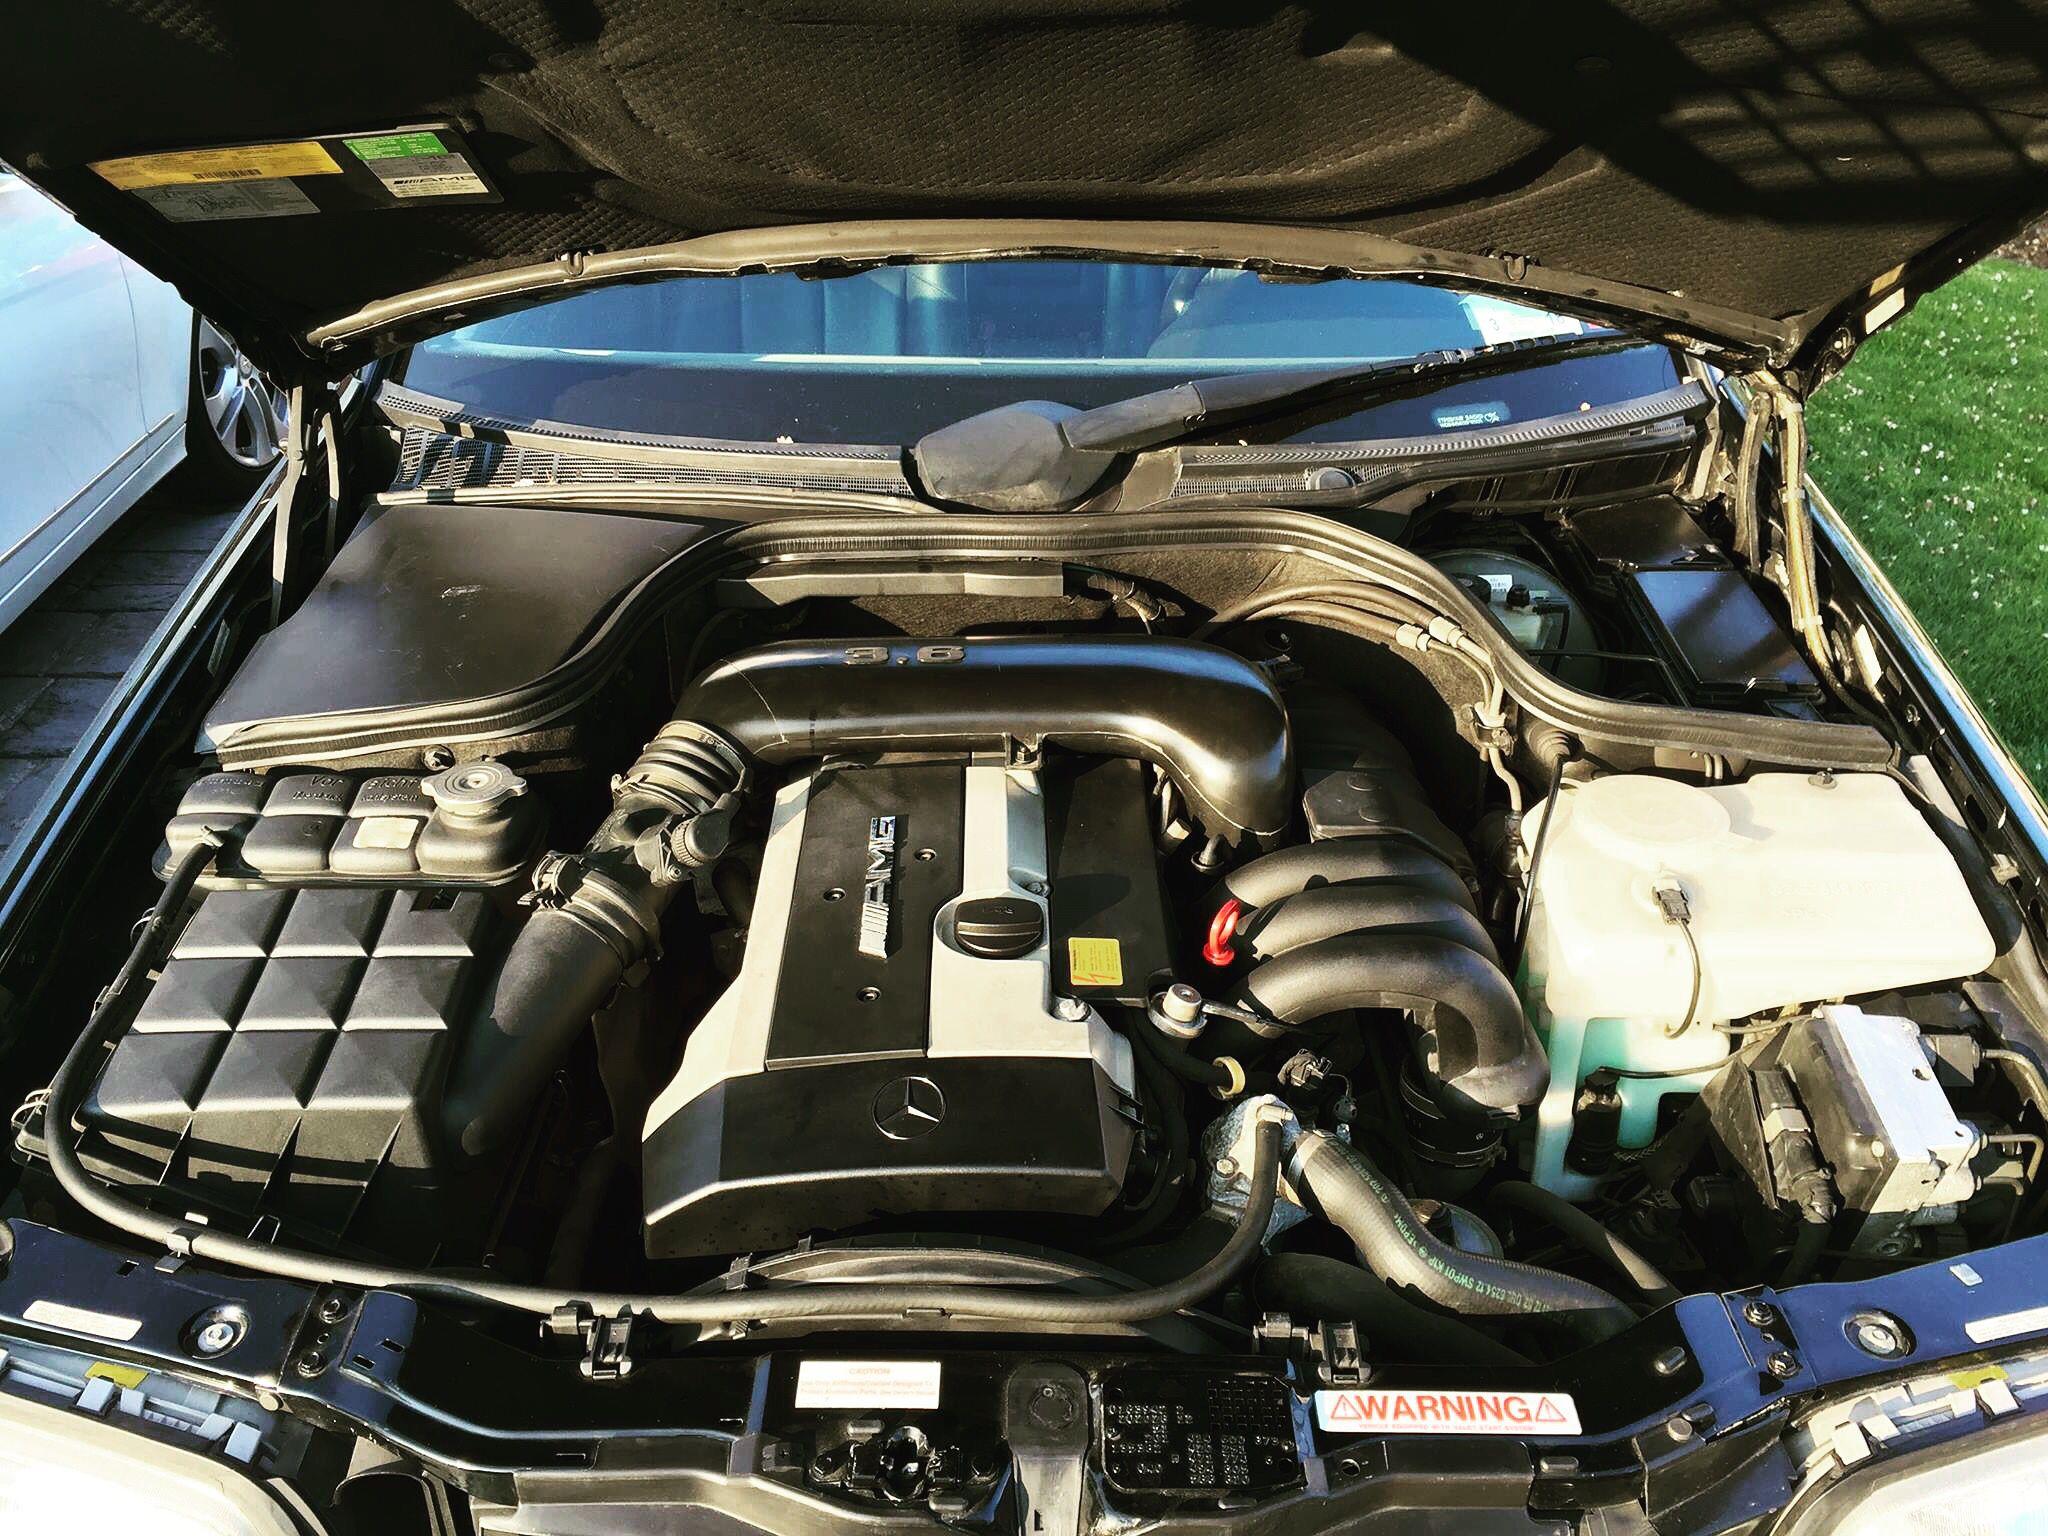 Mercedes C36 AMG (W202) M104 engine | Euro Elite | Audi